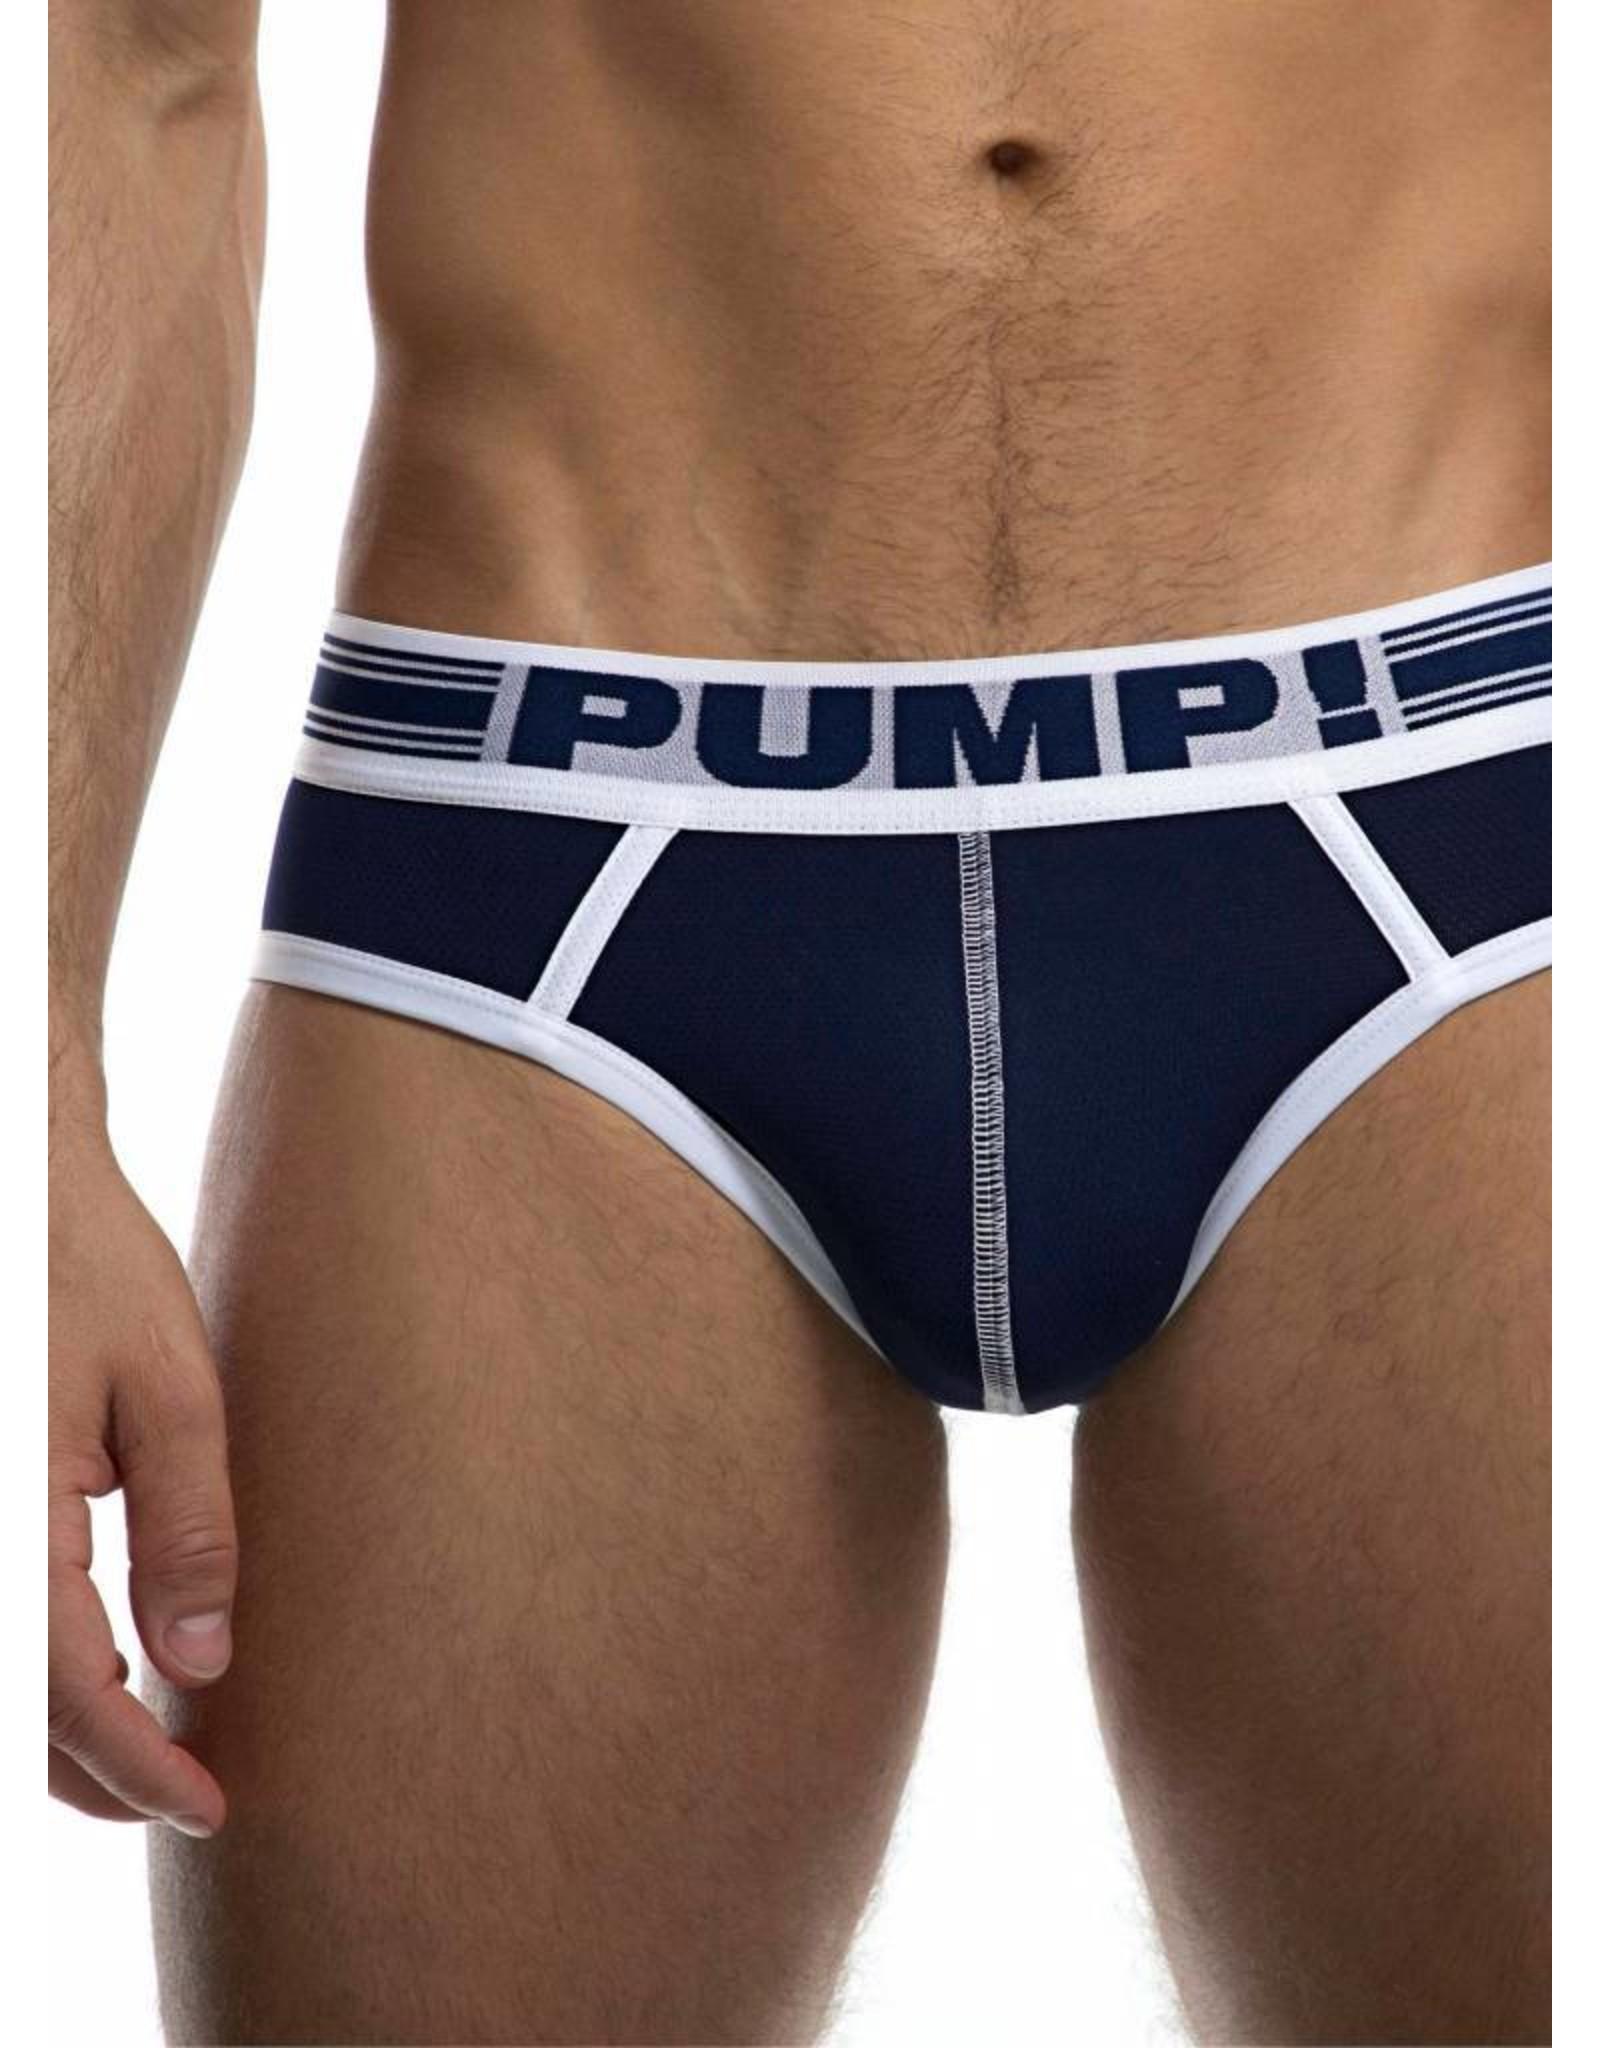 PUMP! PUMP! Sailor Brief